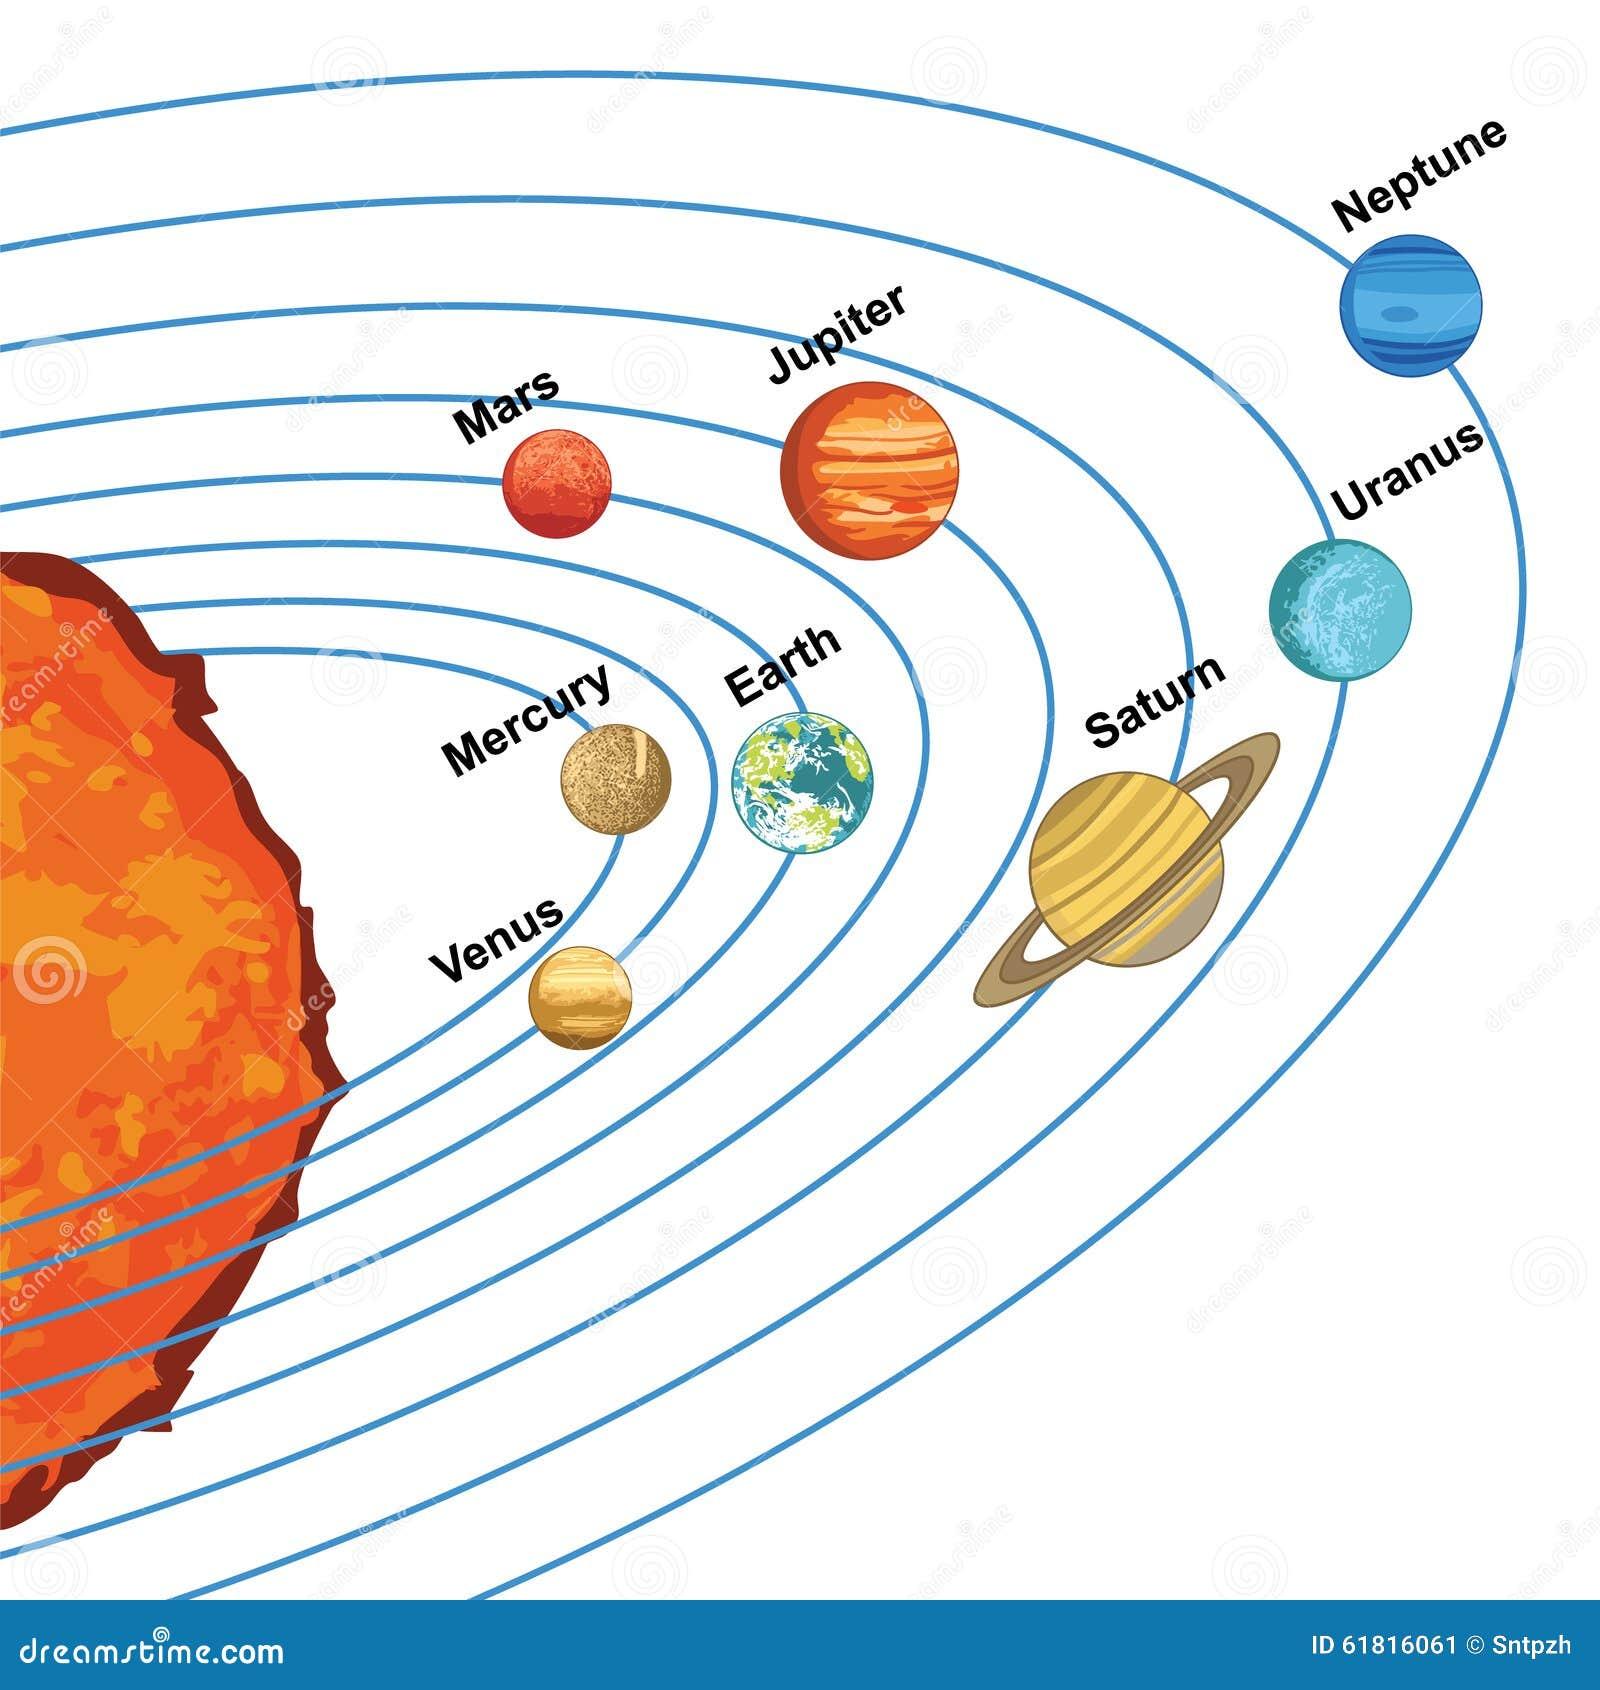 Stock Illustration Illustration Solar System Showing Planets Around Sun Image61816061 on Solar System Worksheets